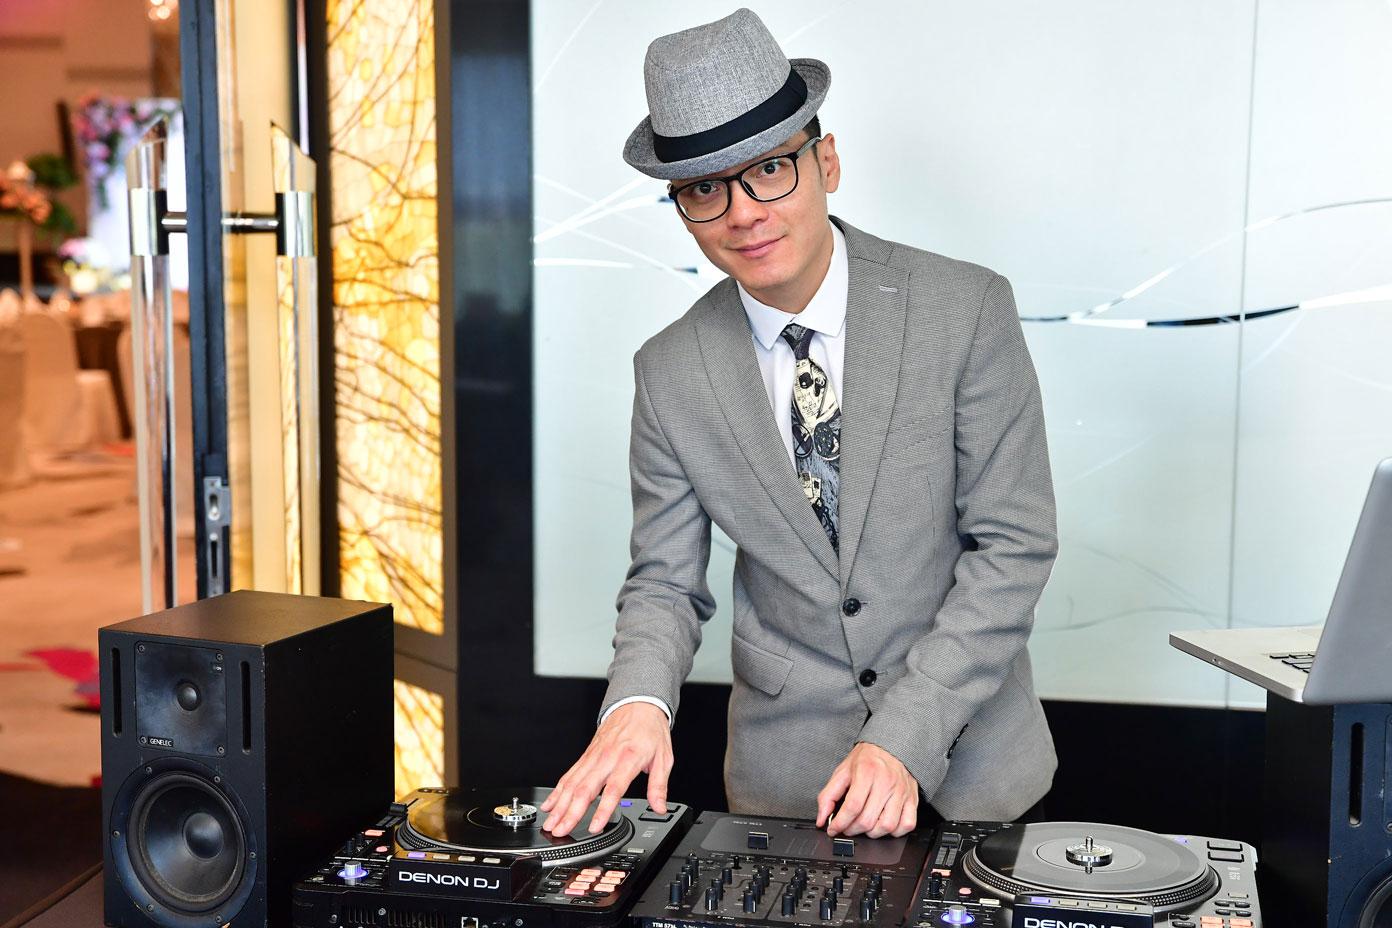 SG Wedding DJ - Professional Wedding DJ (Singapore) | Unique